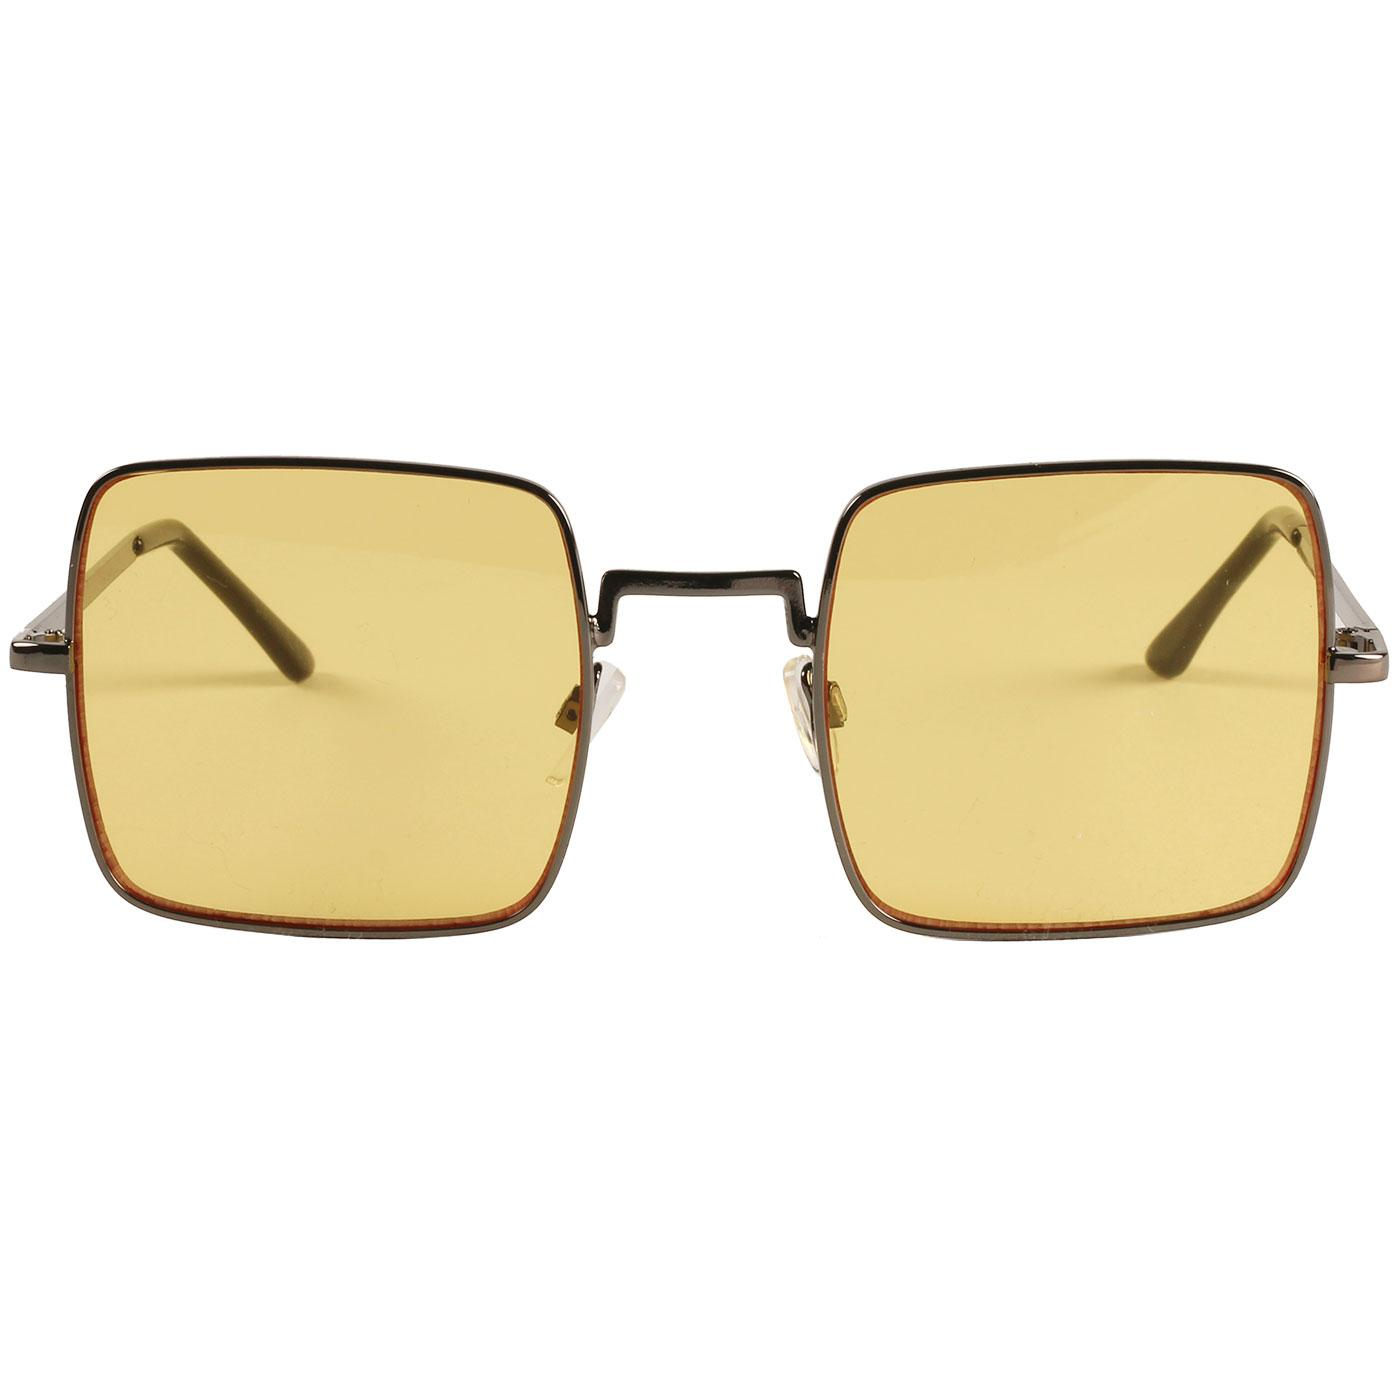 Harrison MADCAP ENGLAND 60s Square Sunglasses (Y)